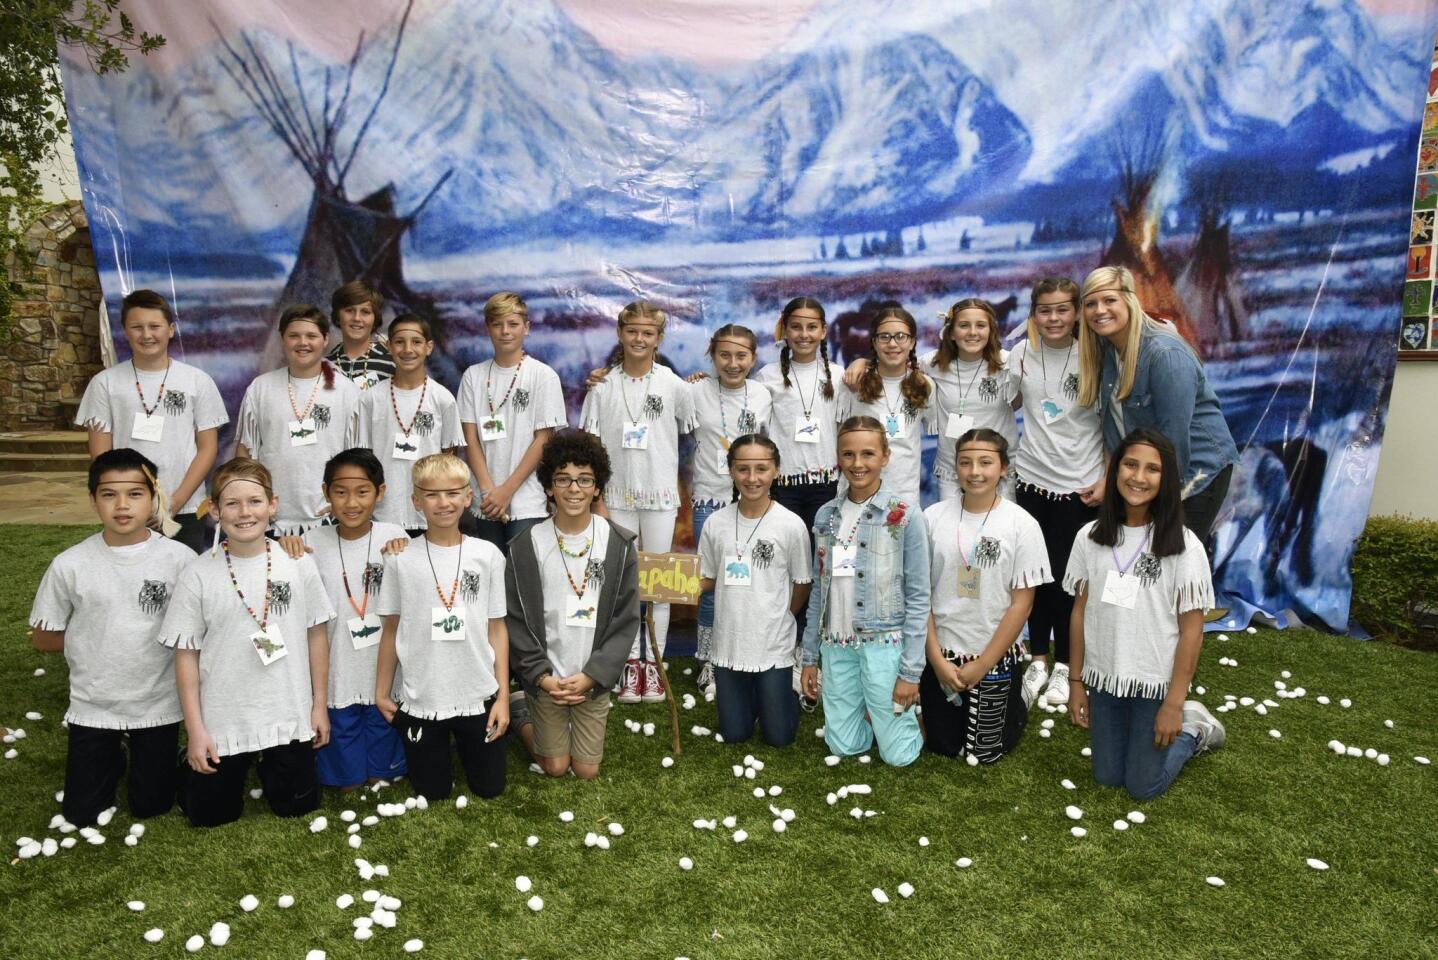 Native American culture celebrated at The Nativity School